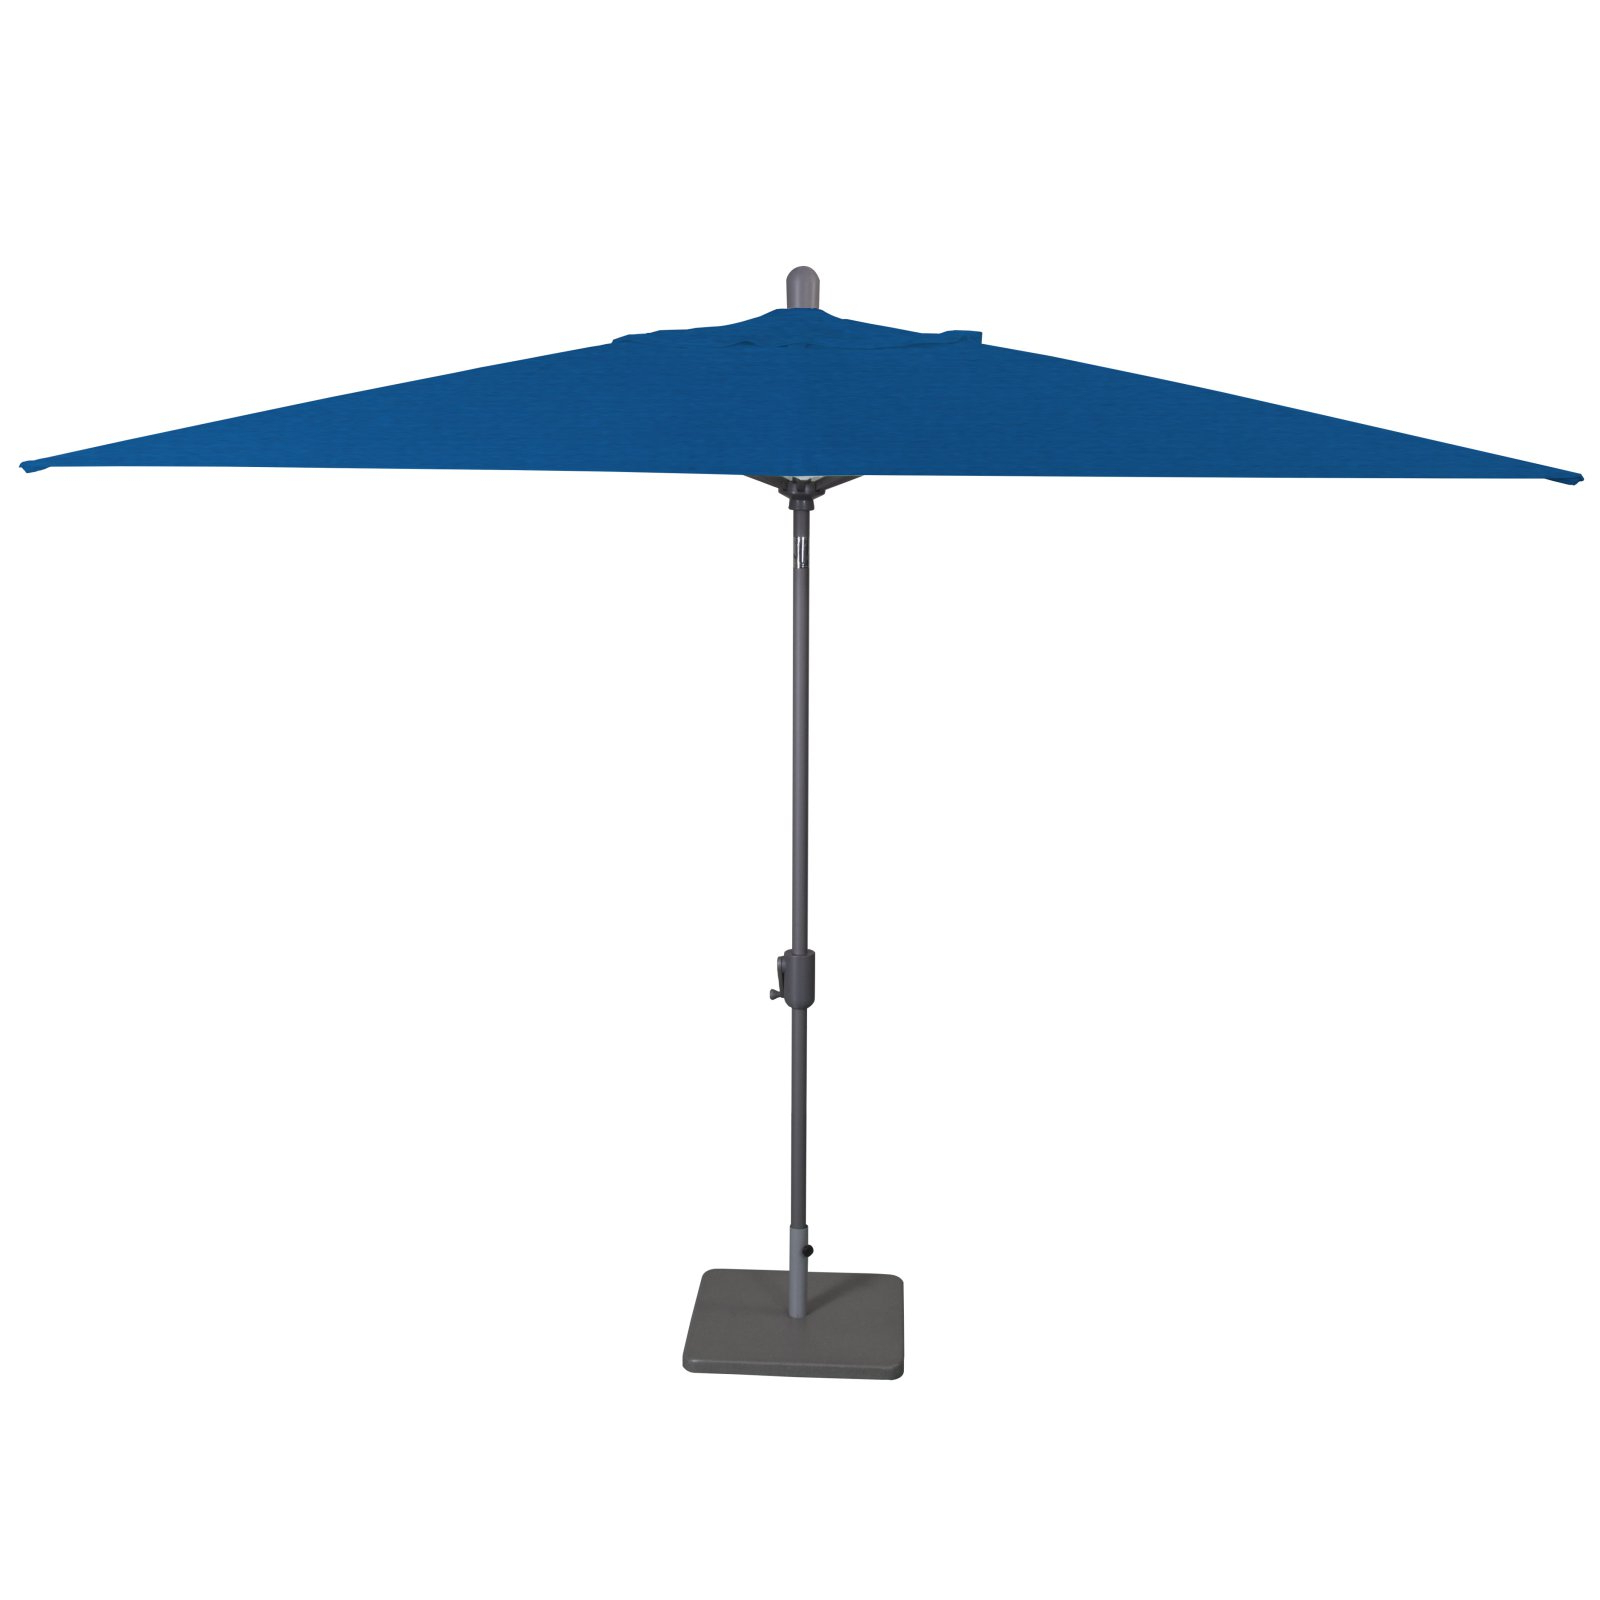 Most Popular Mullaney Beachcrest Home Market Umbrellas Intended For Amauri Laguna Cove 10 Ft. X 6.5 Ft. Rectangular Sunbrella Auto Tilt (Gallery 5 of 20)